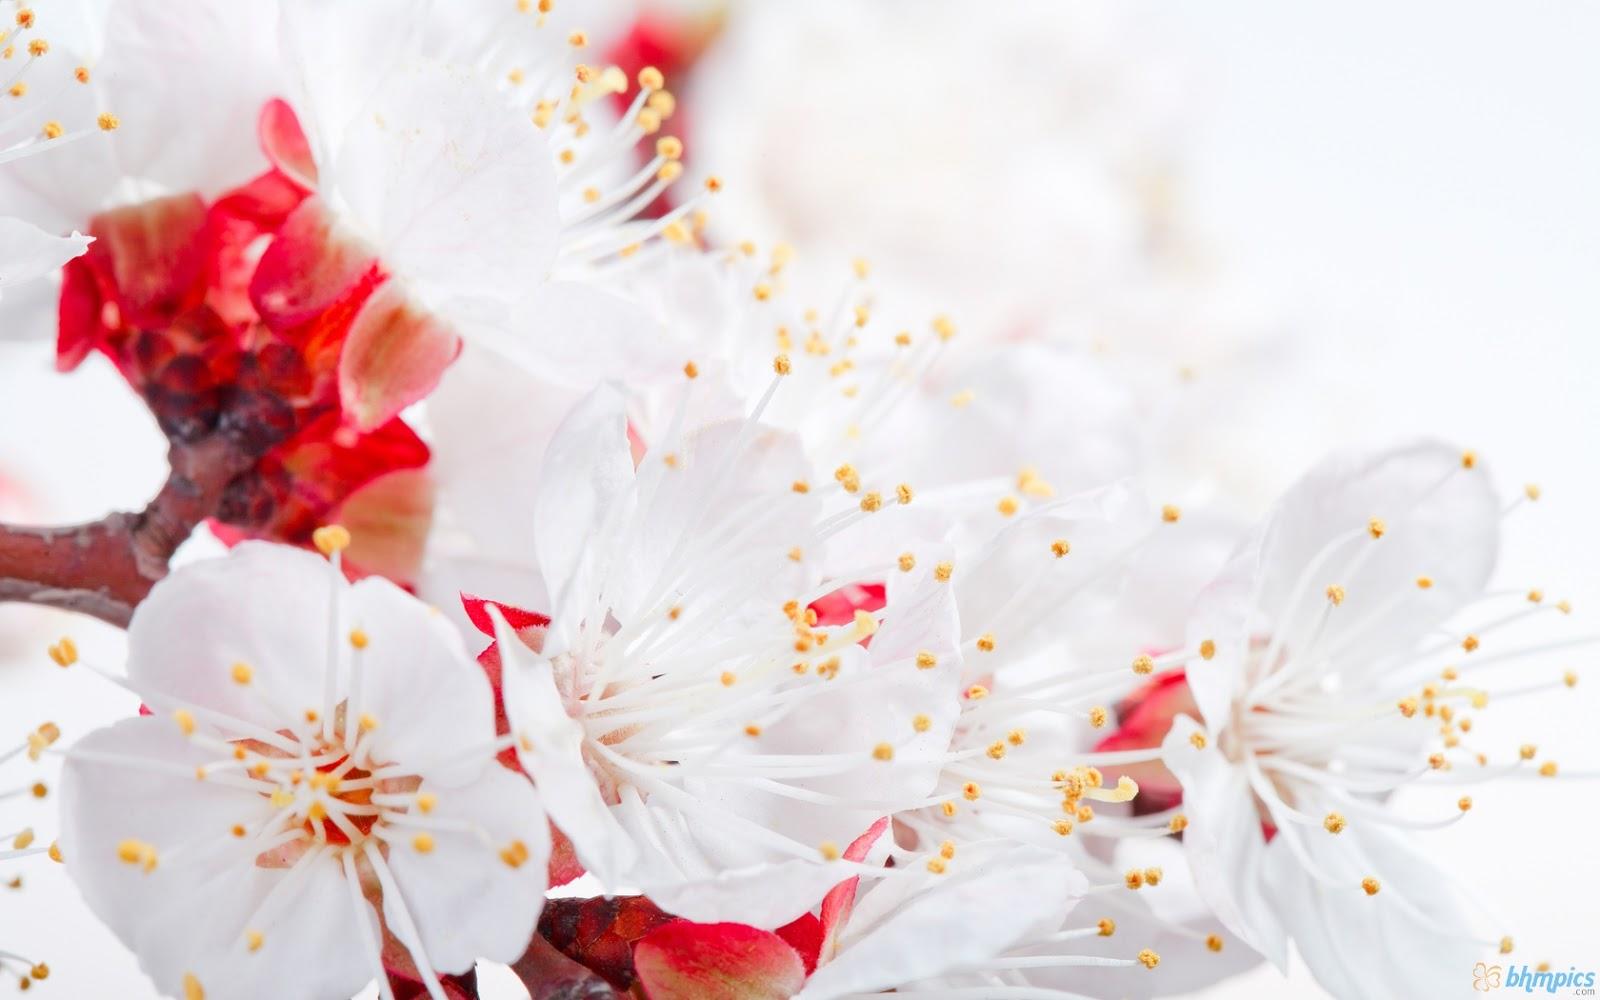 http://3.bp.blogspot.com/-5cLuQXTJeHw/ULxIqfTpI5I/AAAAAAAAH5c/4Q5Xl-kLg9s/s1600/spring_apple_blossom_branch-1680x1050.jpg